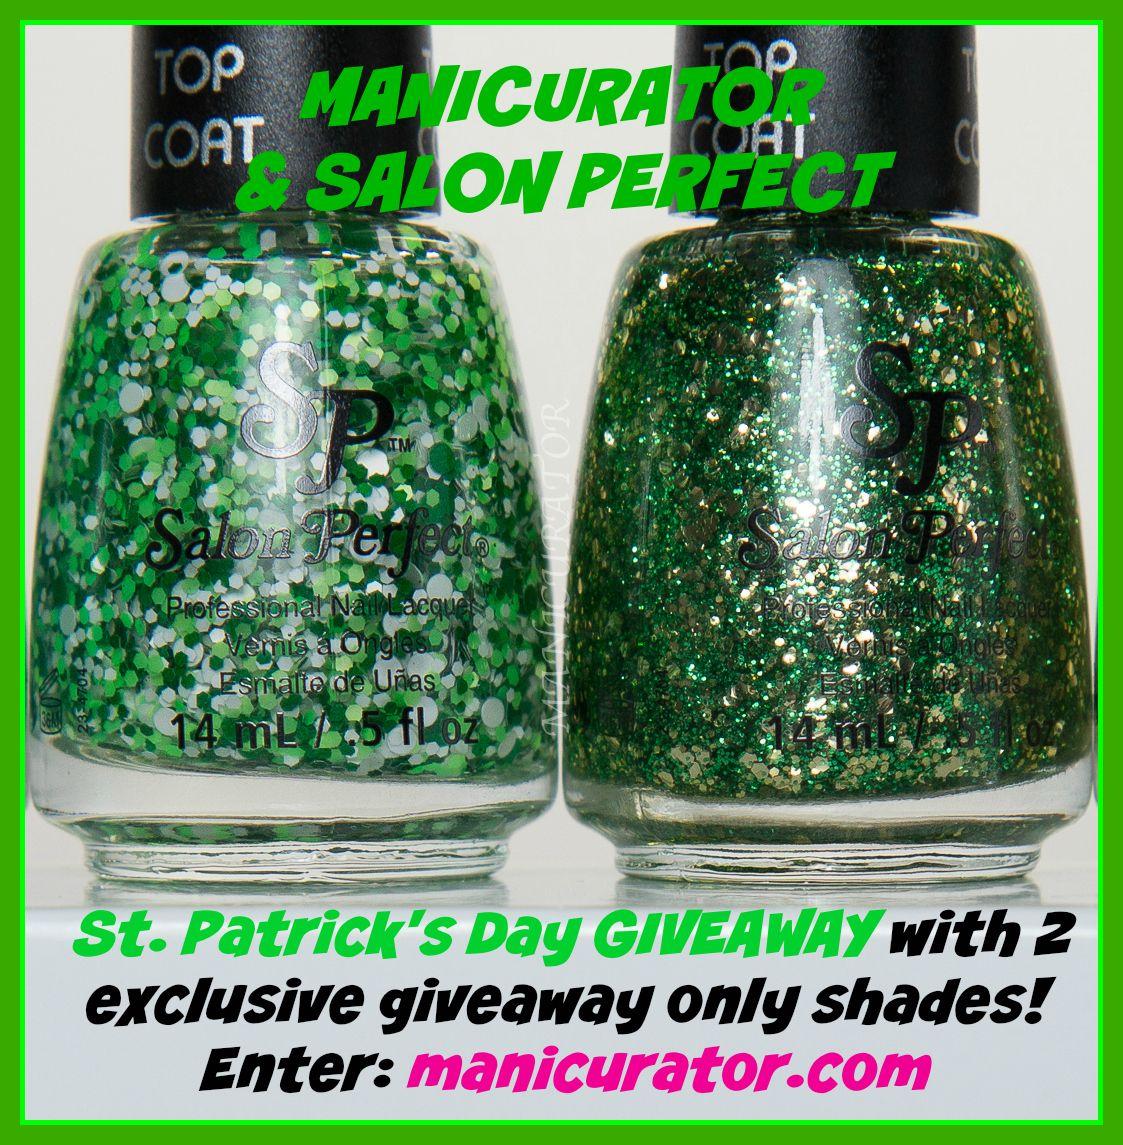 Salon-Perfect-St-Patrick\'s-Nail-Art-Giveaway | Giveaways | Pinterest ...